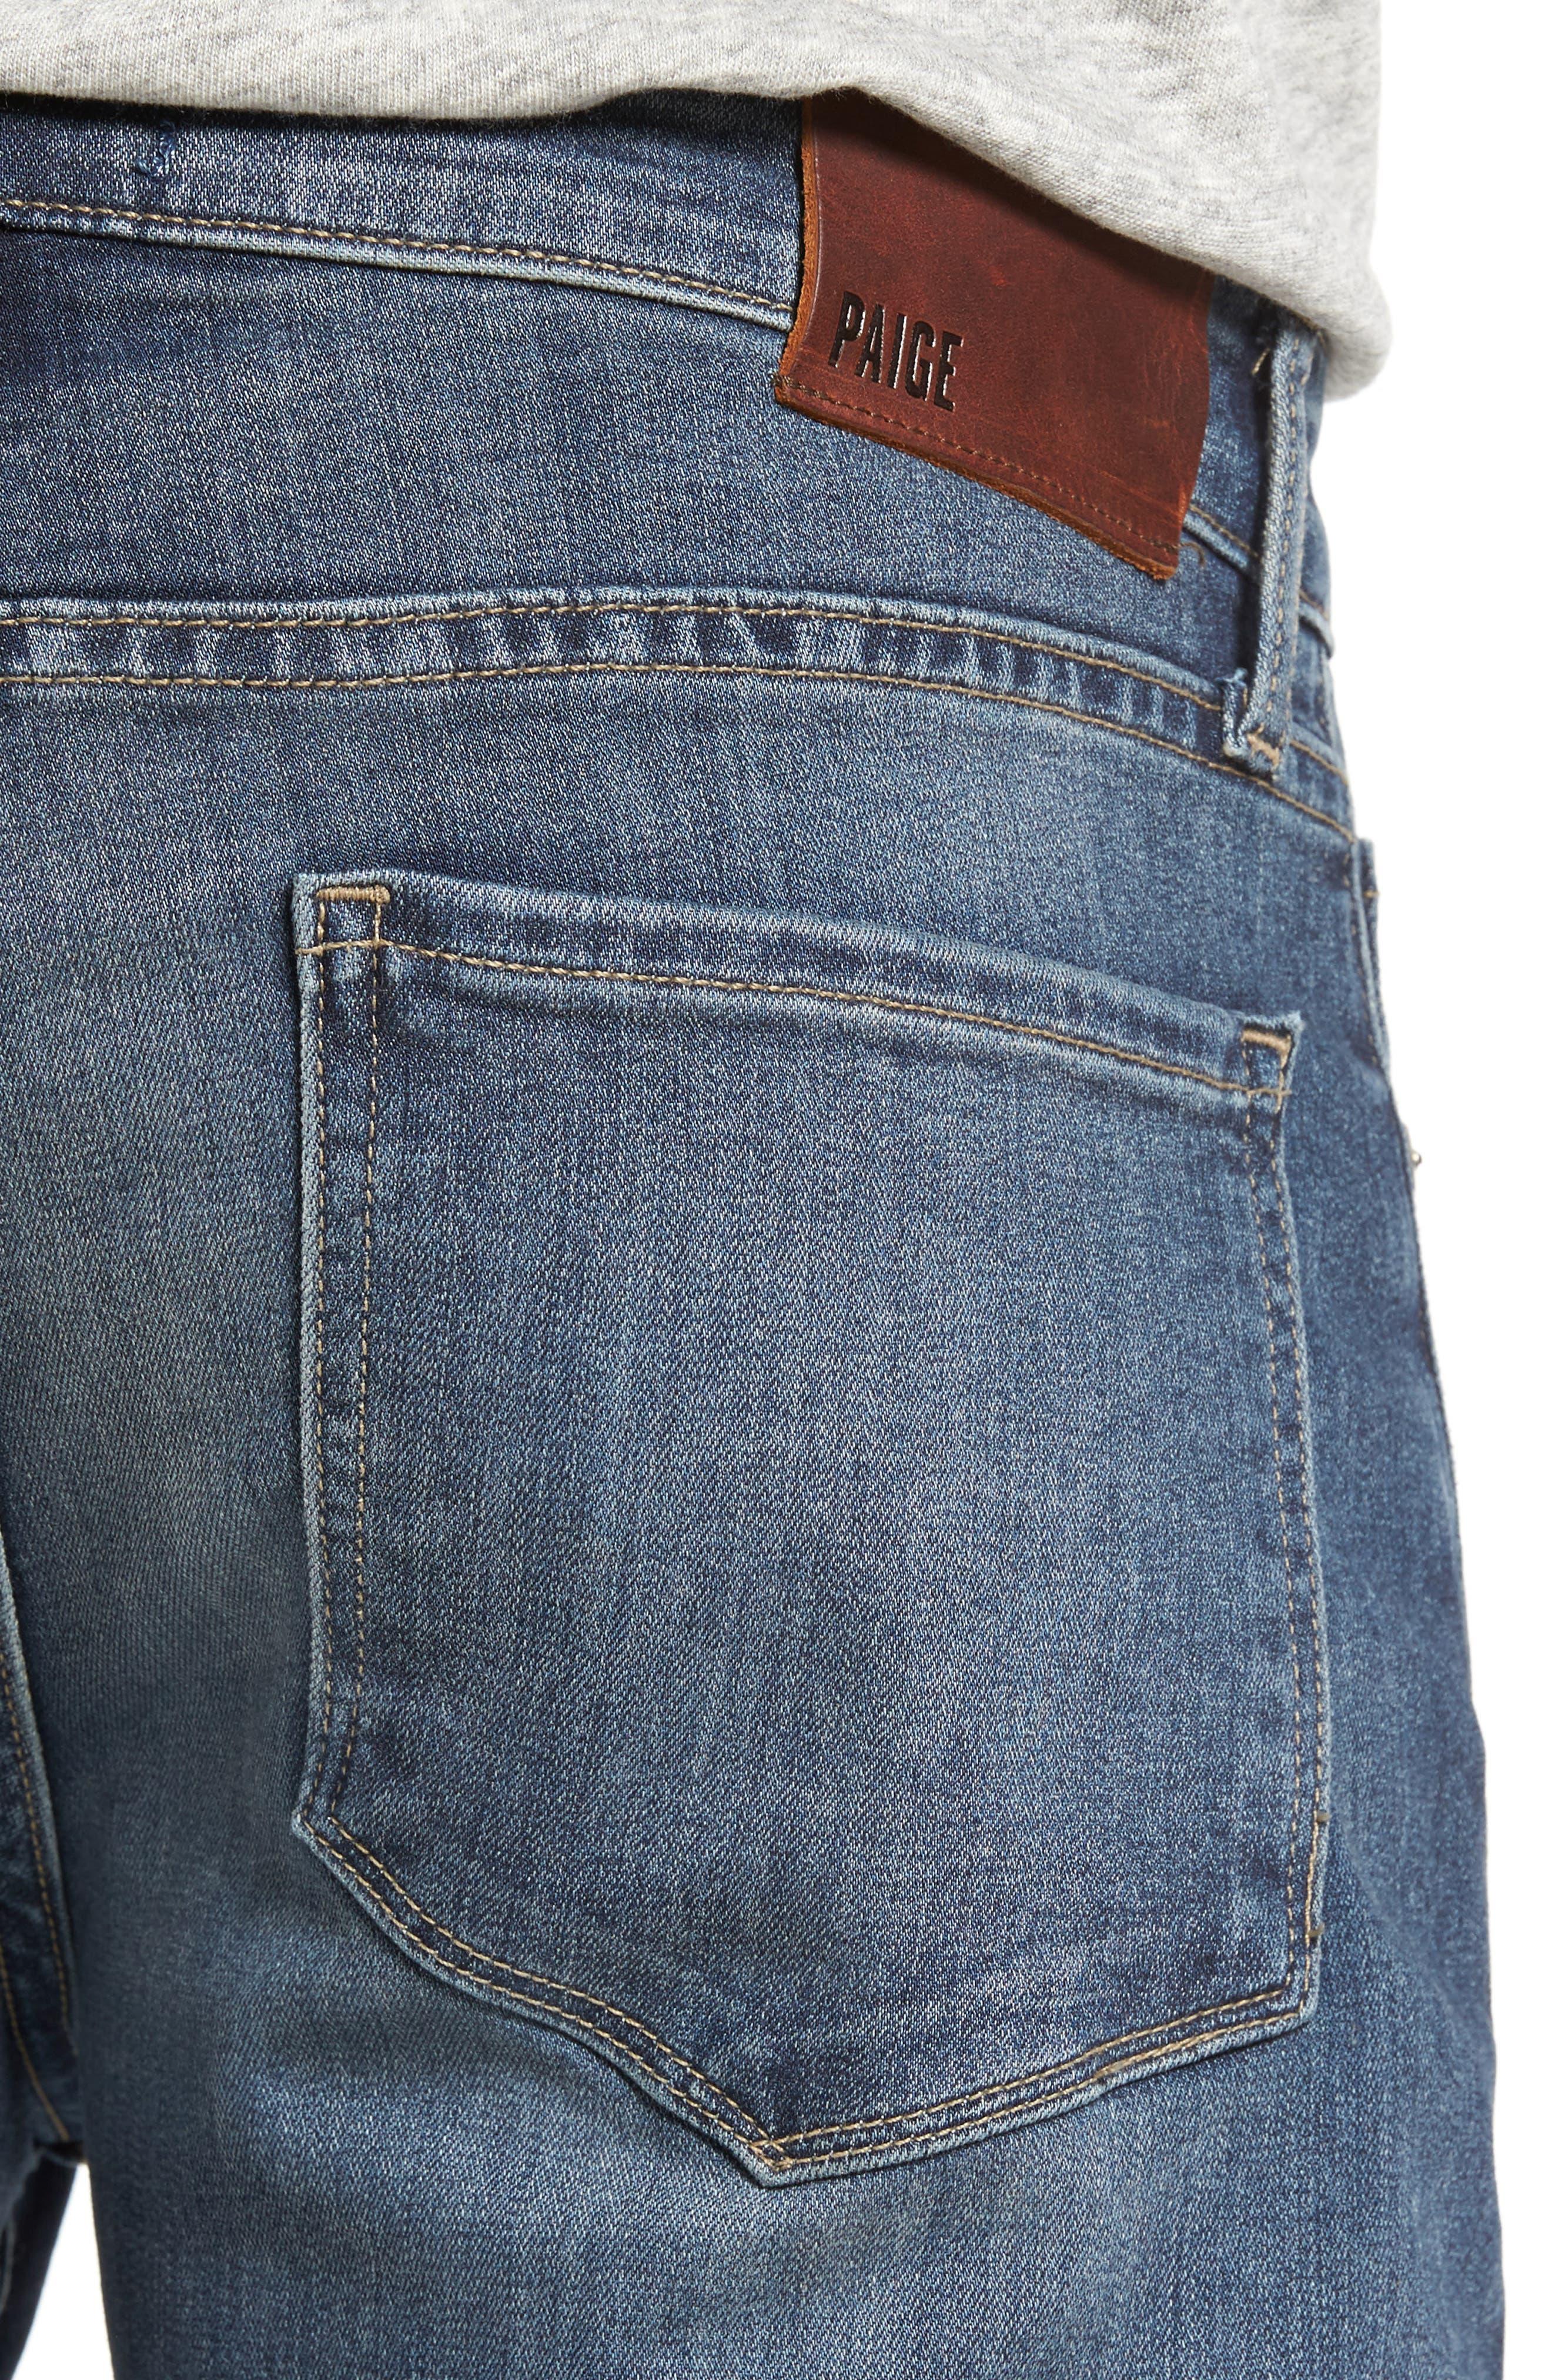 Transcend - Lennox Slim Fit Jeans,                             Alternate thumbnail 4, color,                             Elwood